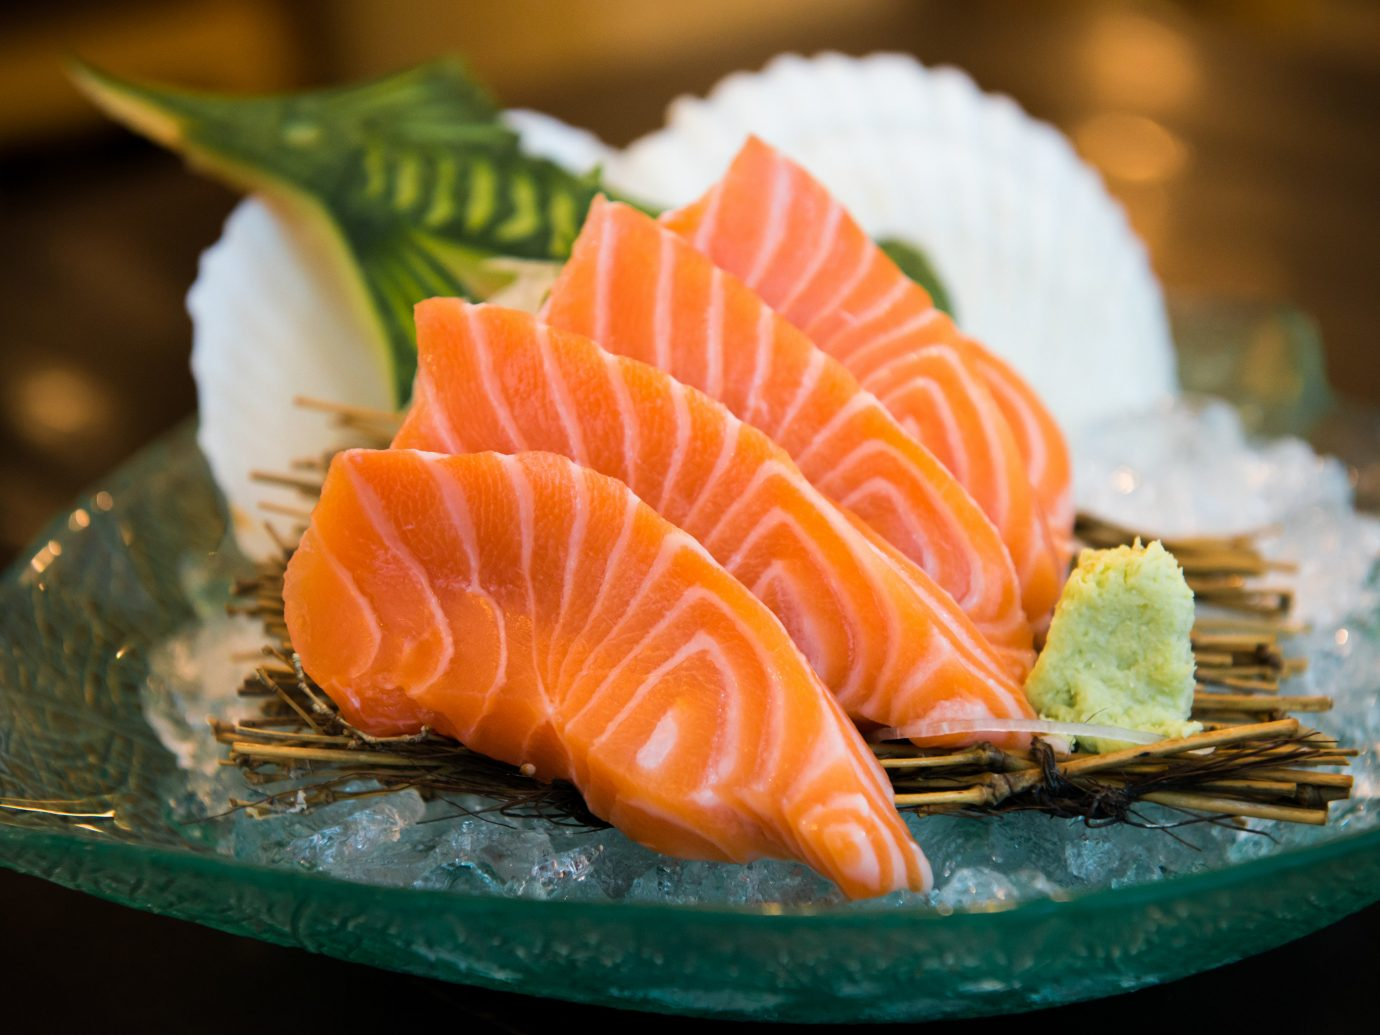 Trip Ideas plate food dish sashimi slice indoor cuisine bowl fruit asian food plant sushi fish smoked salmon sliced oranges japanese cuisine salmon orange fresh containing